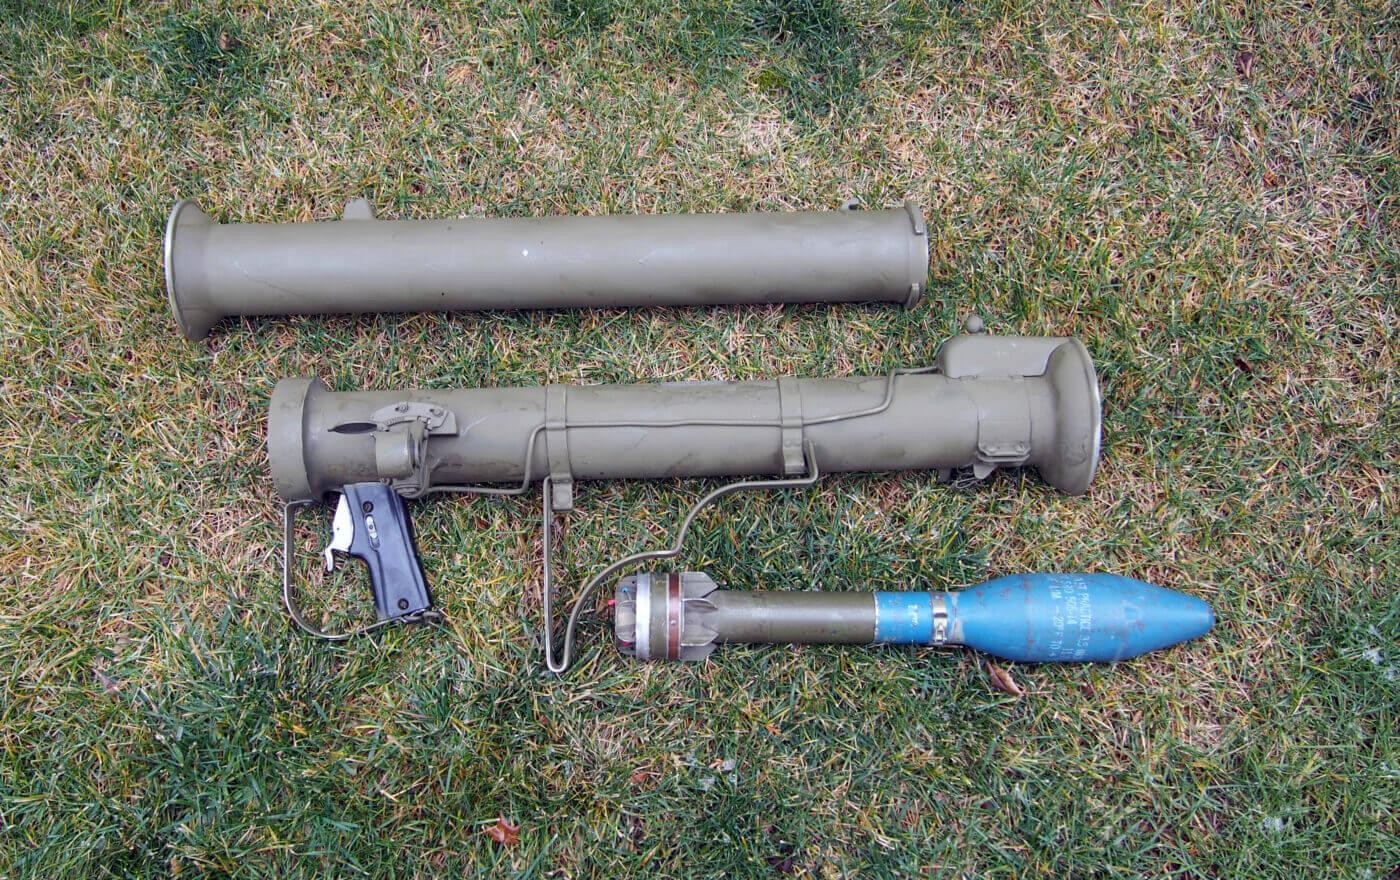 Super bazooka in pieces